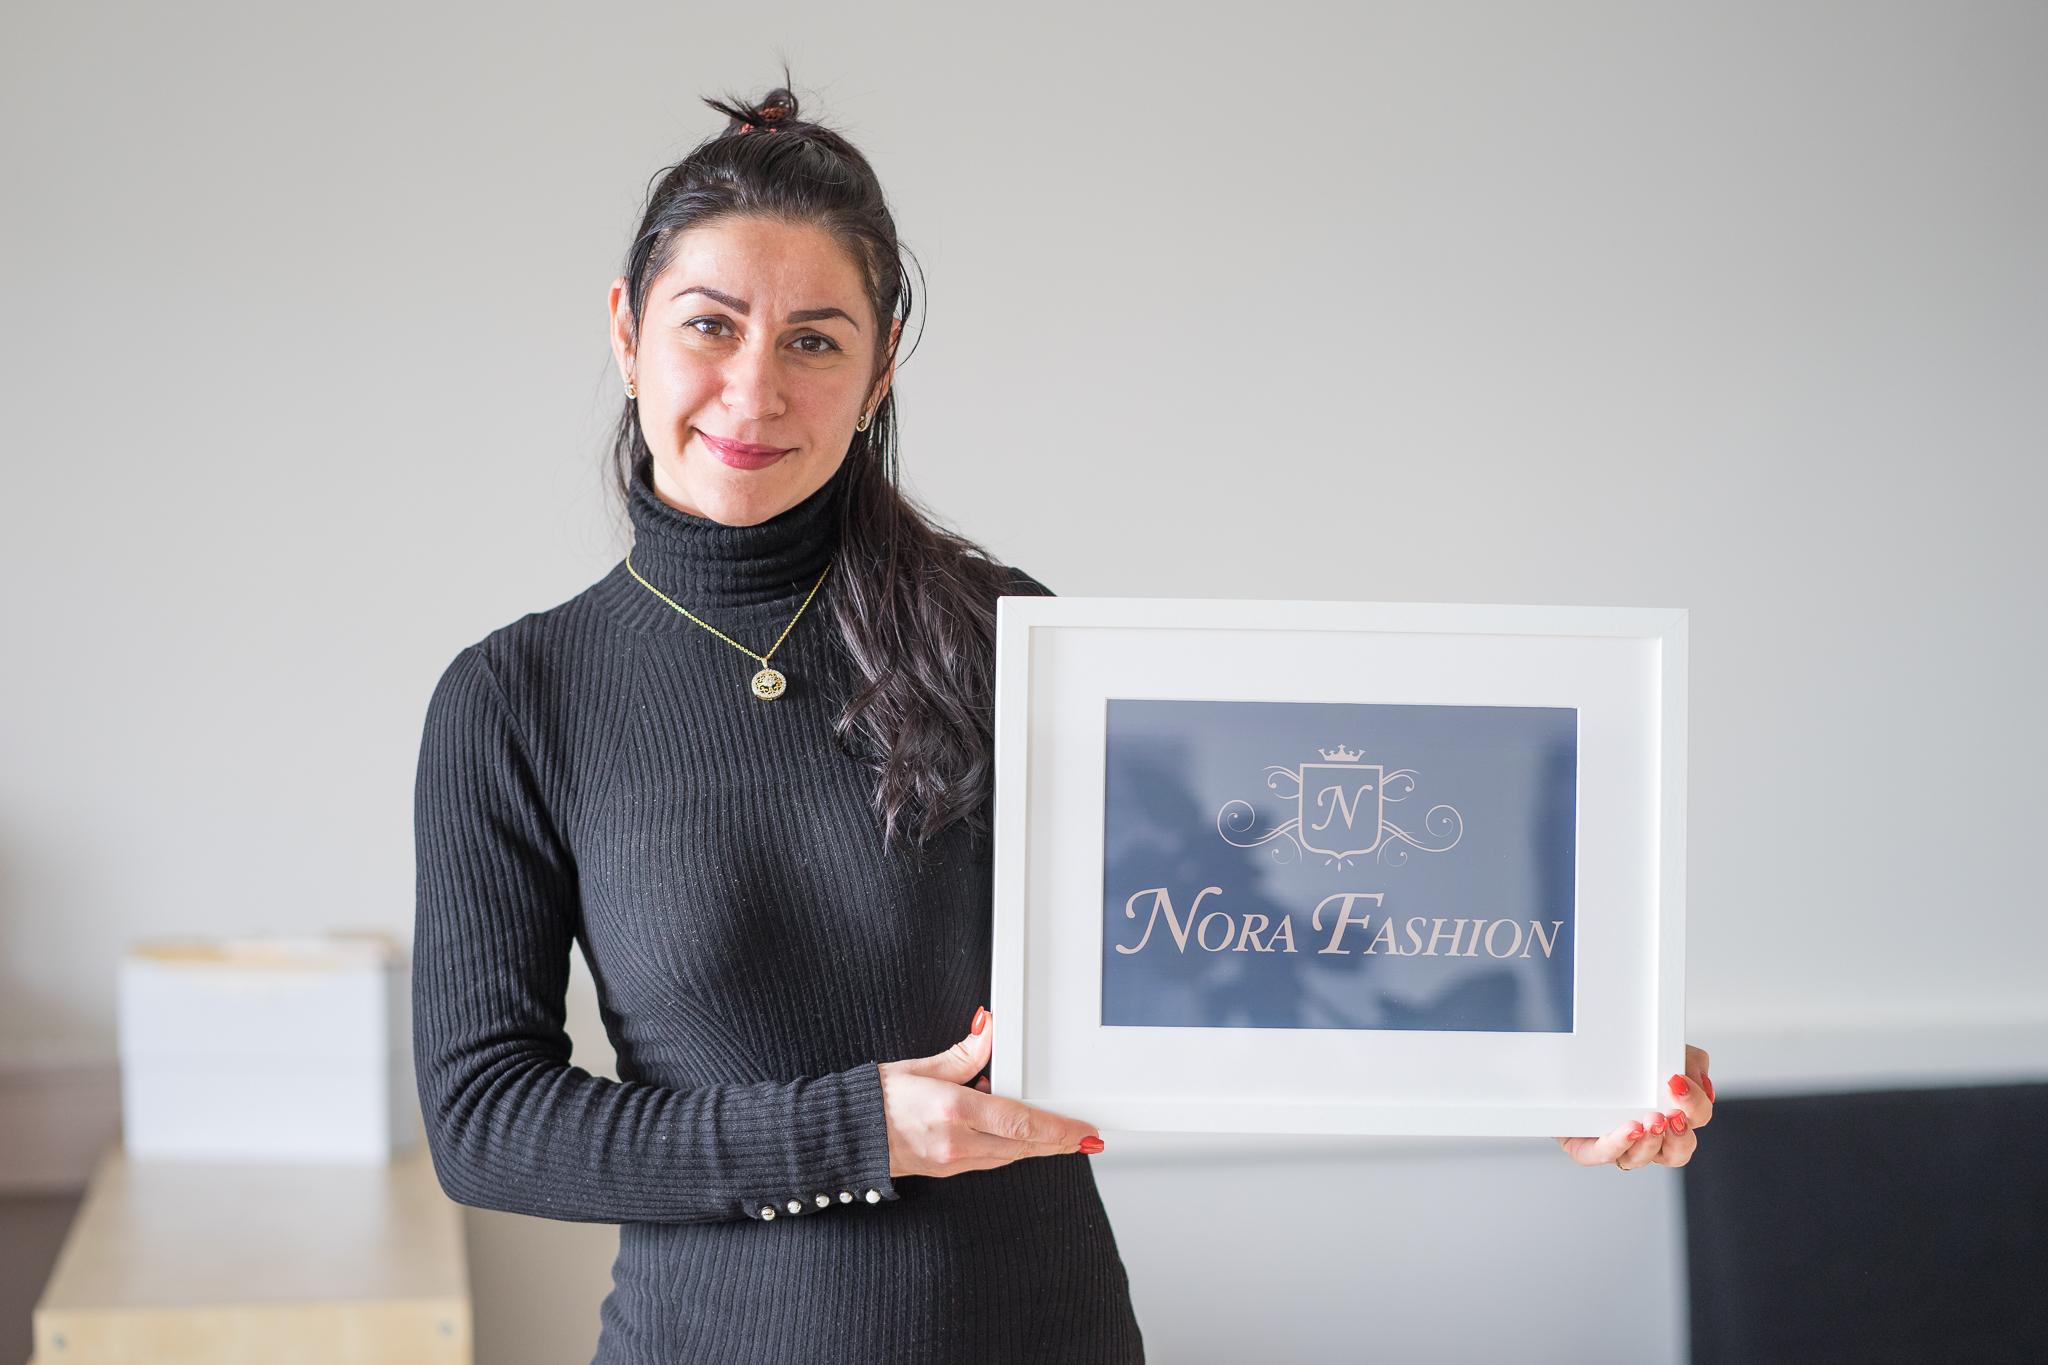 Yana Fetova Nora Fashion